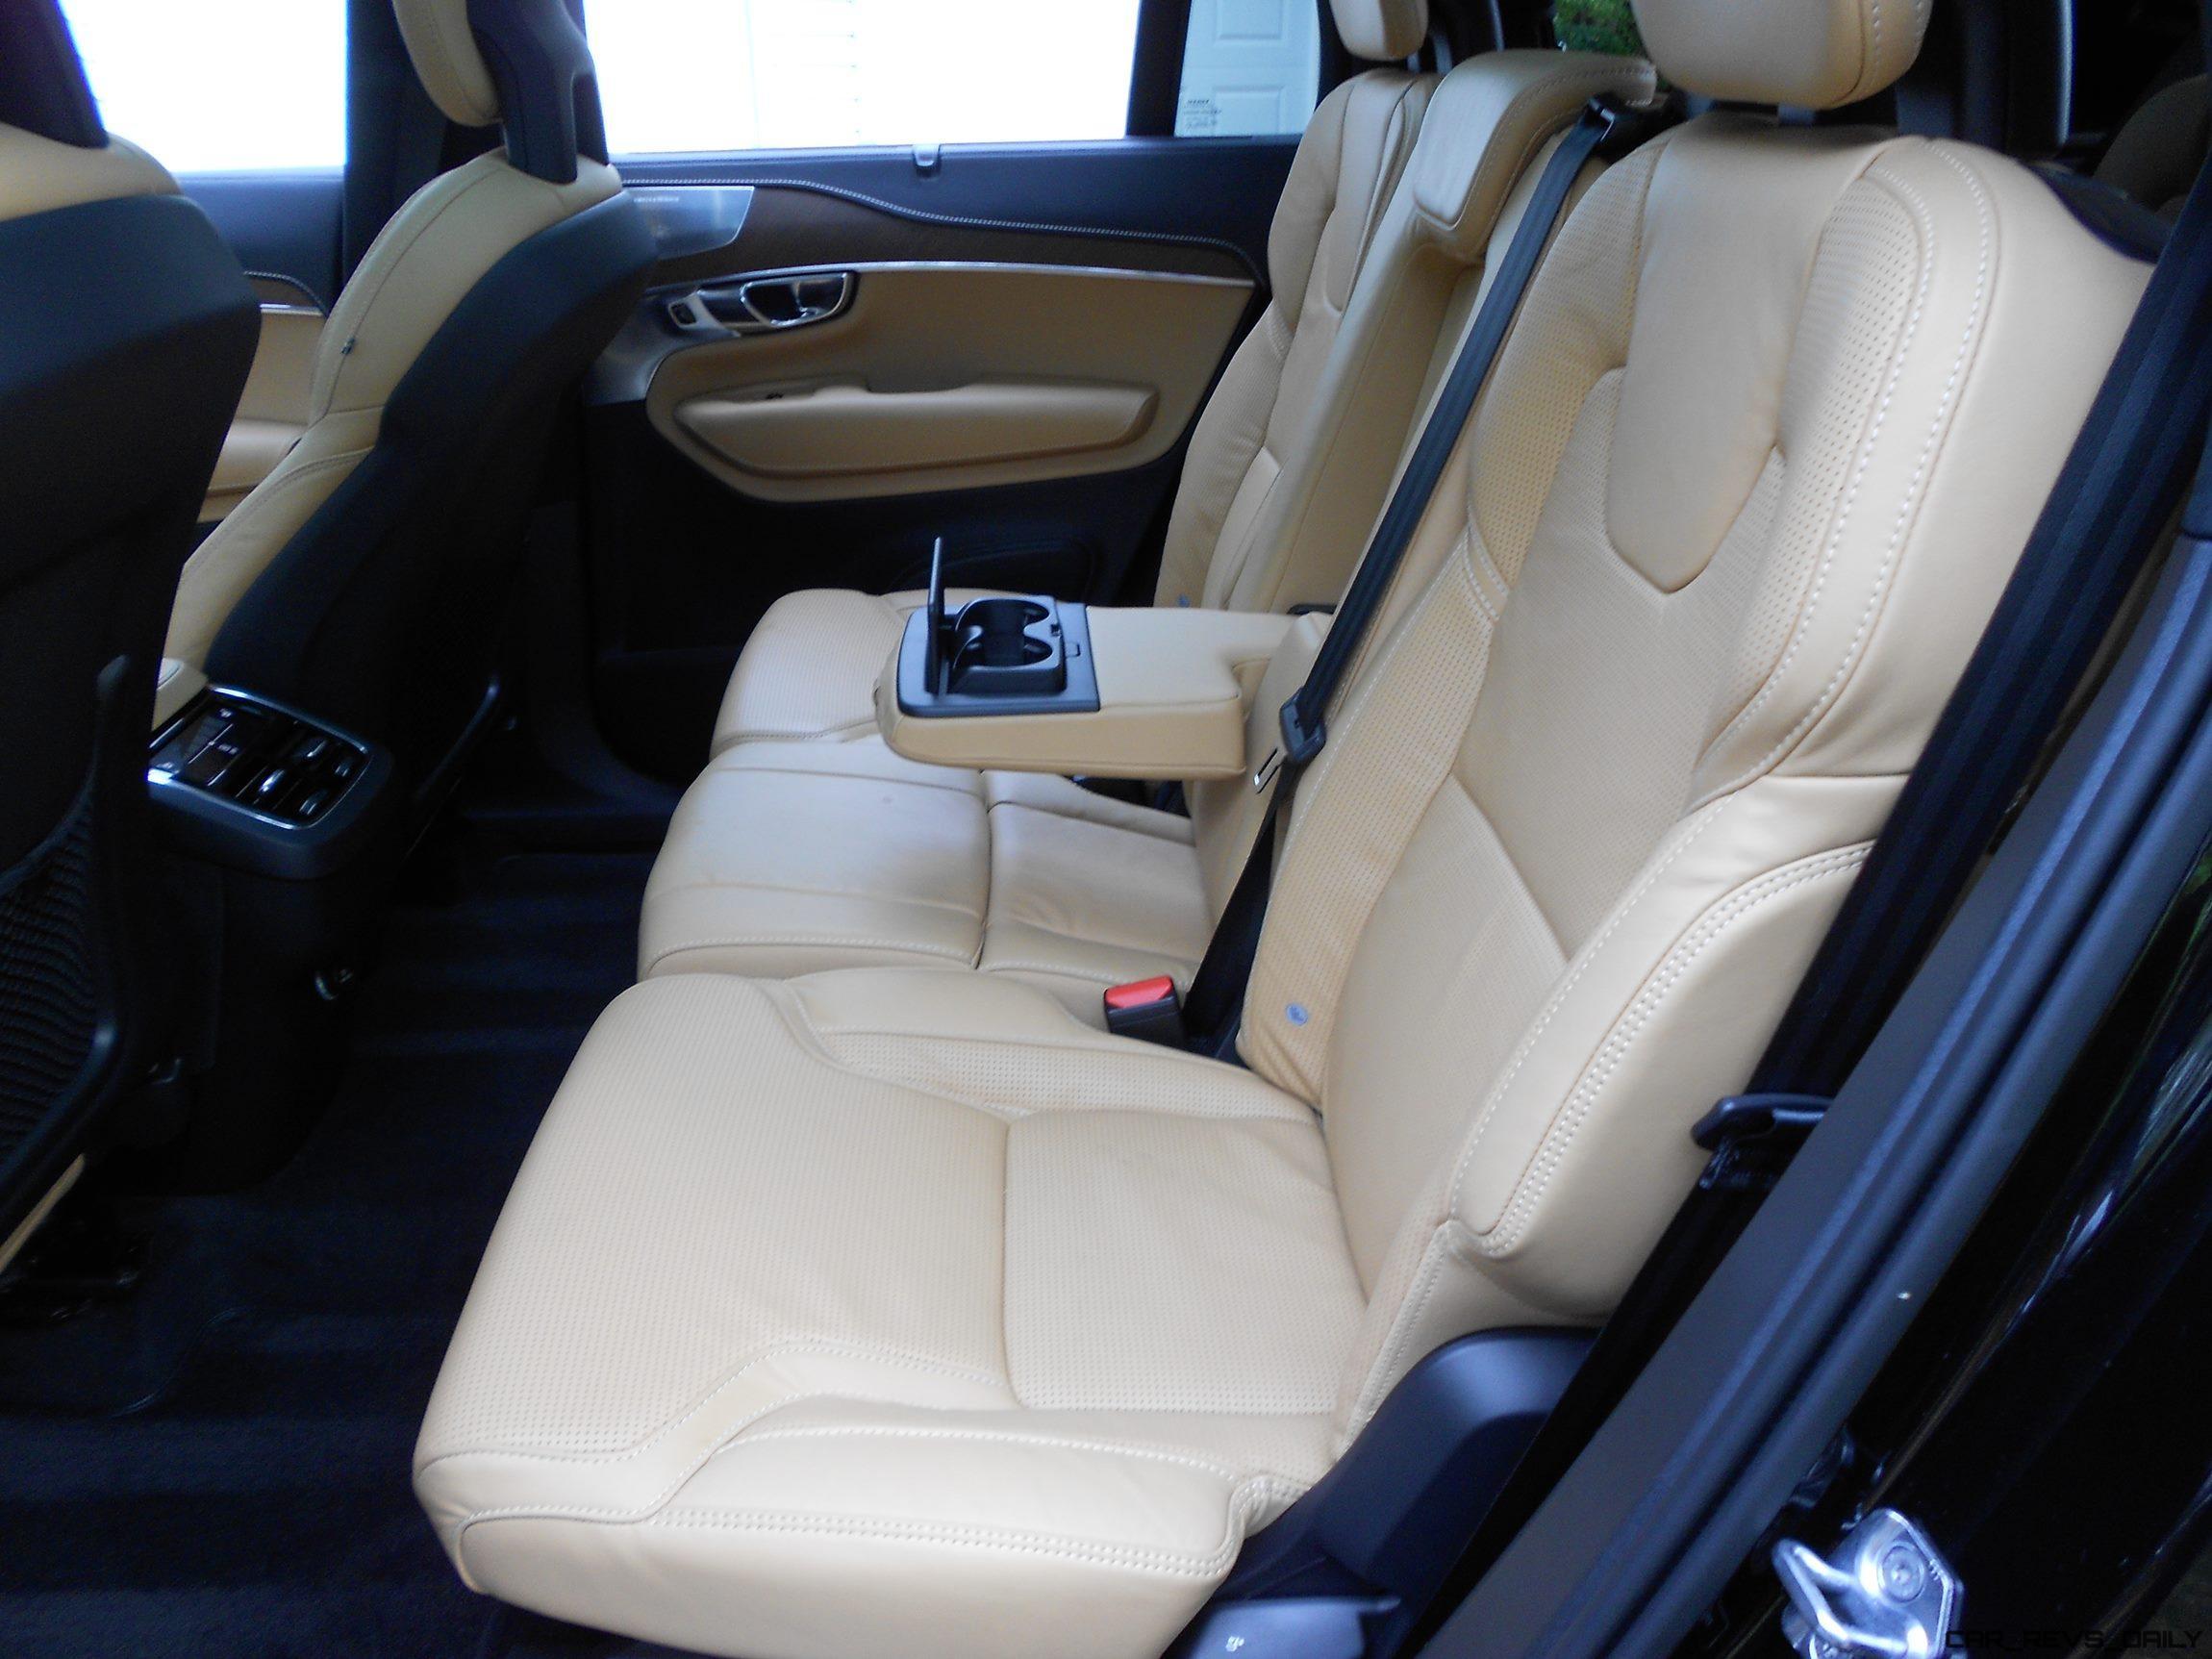 2017 Volvo Xc90 T6 Inscription Awd Interior Photos 2